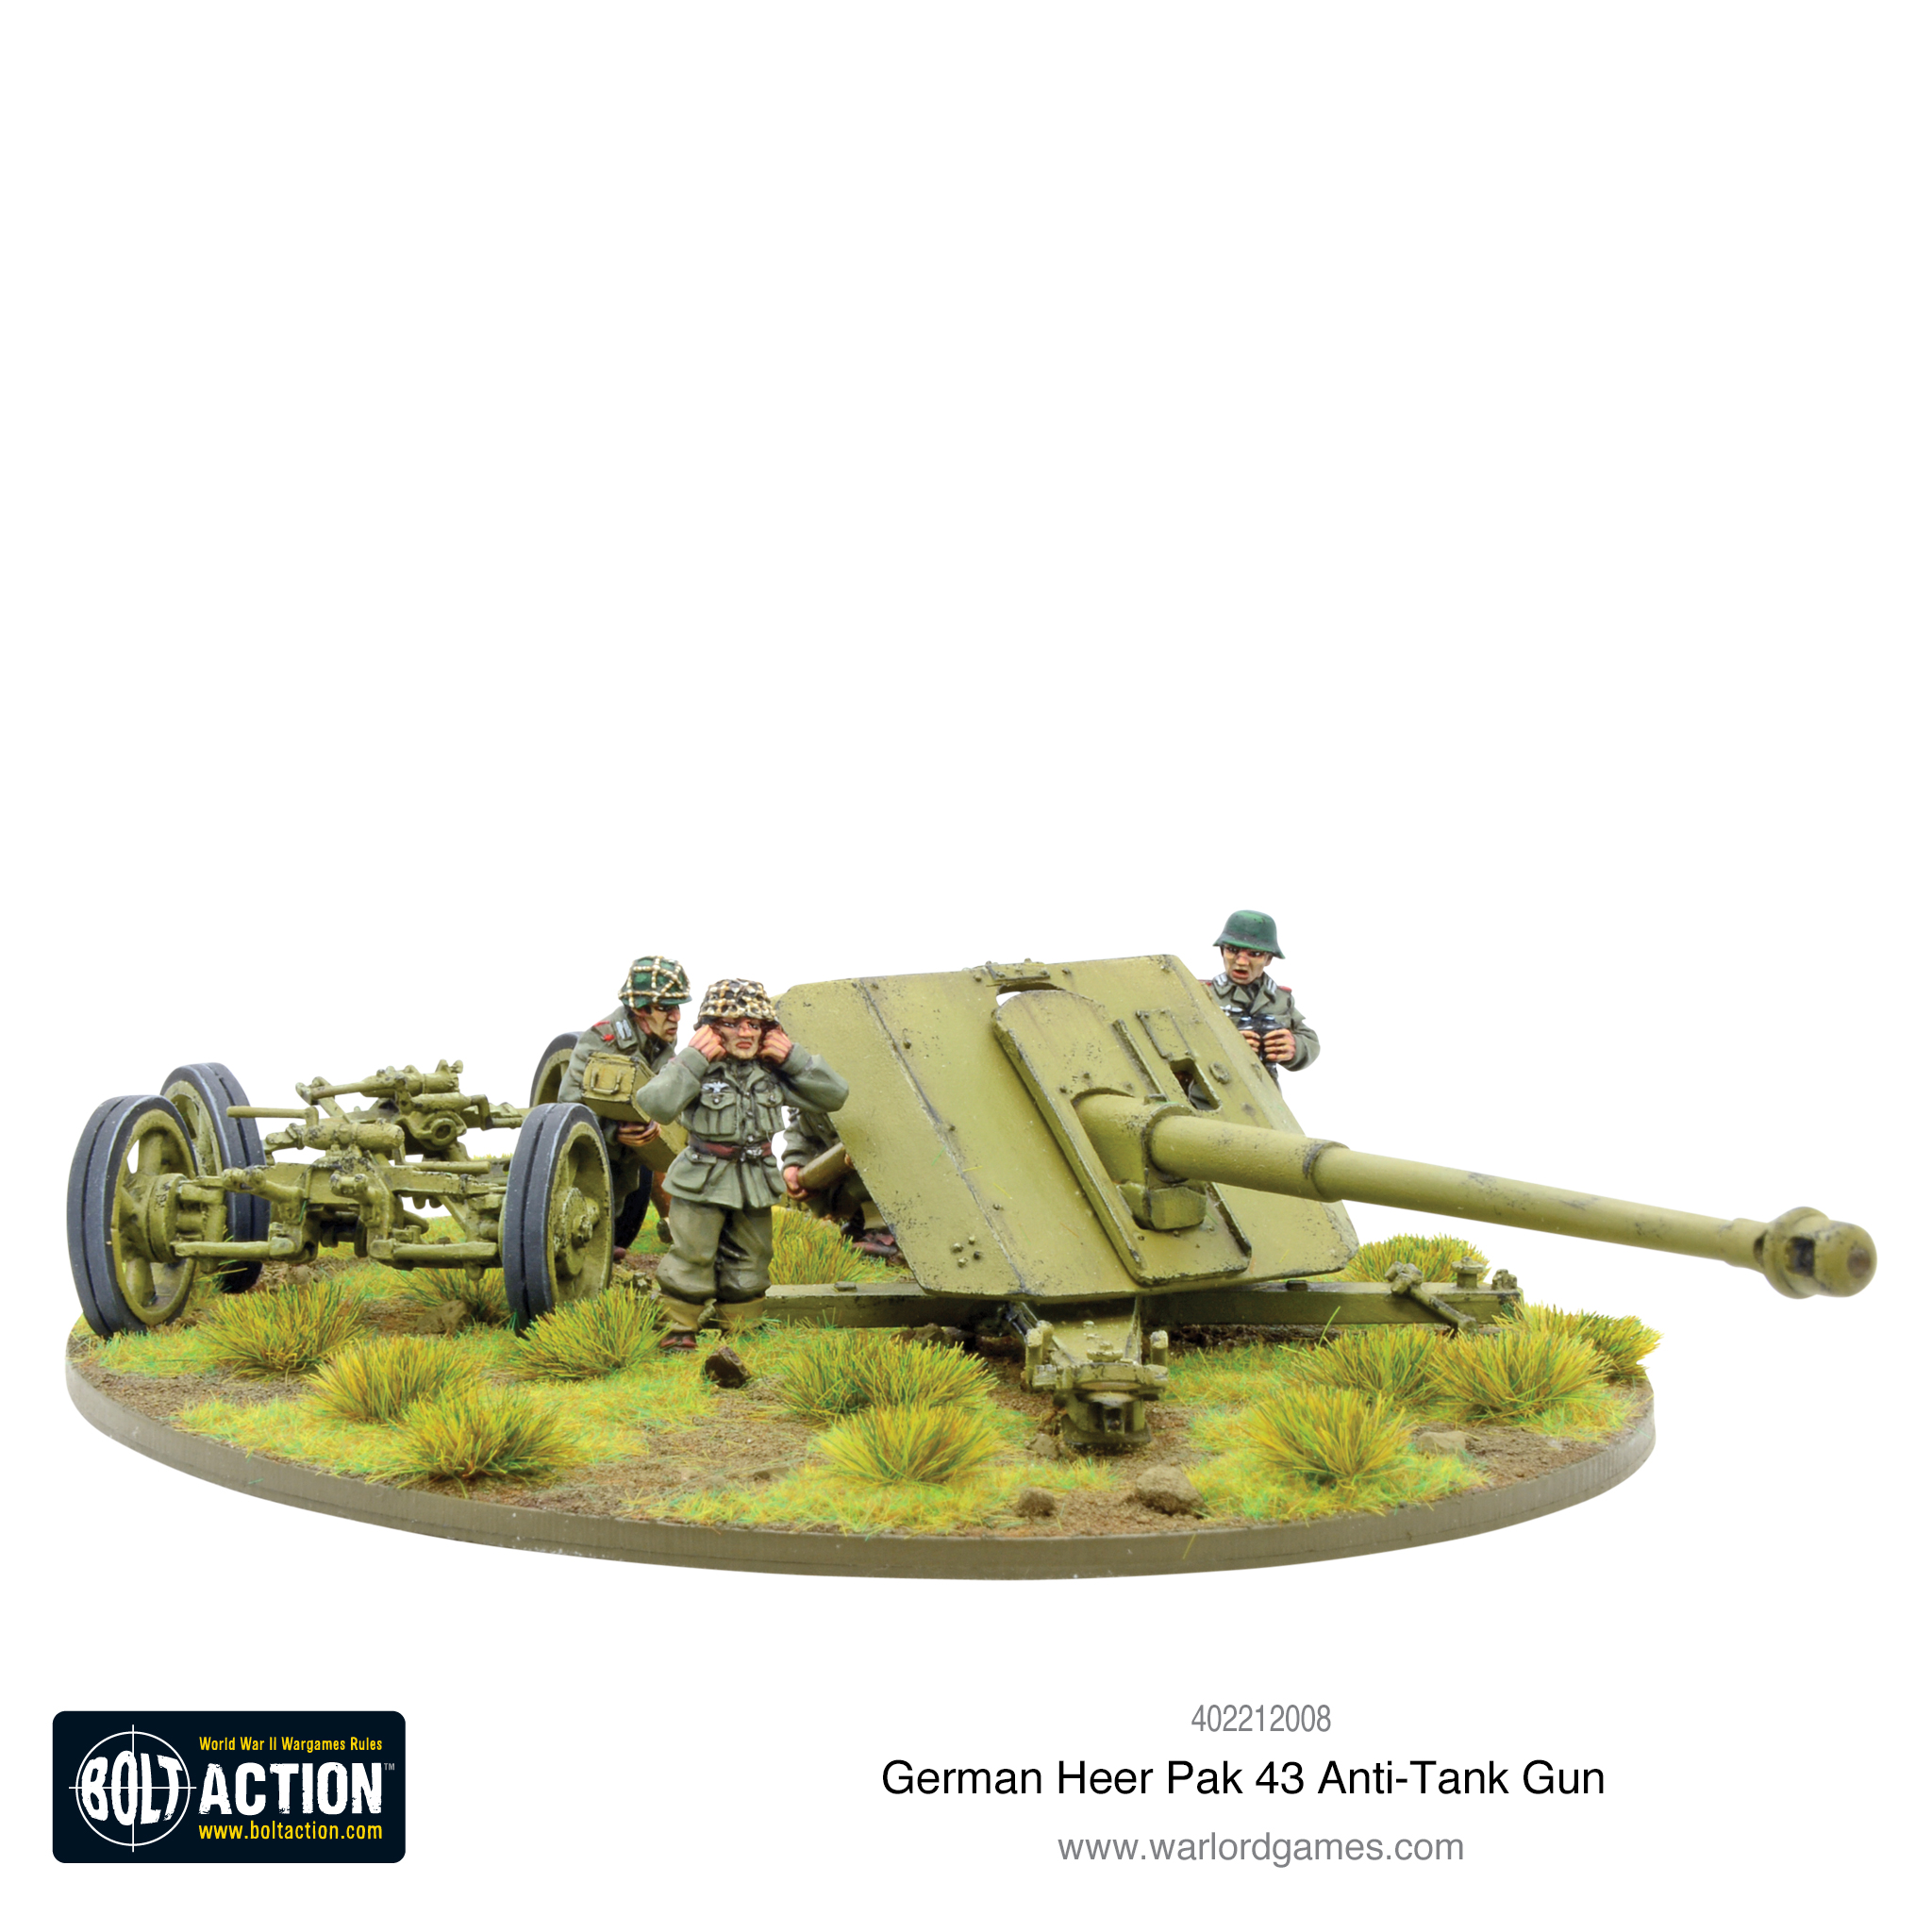 New: German Heer Pak 43 anti-tank gun - Warlord Games